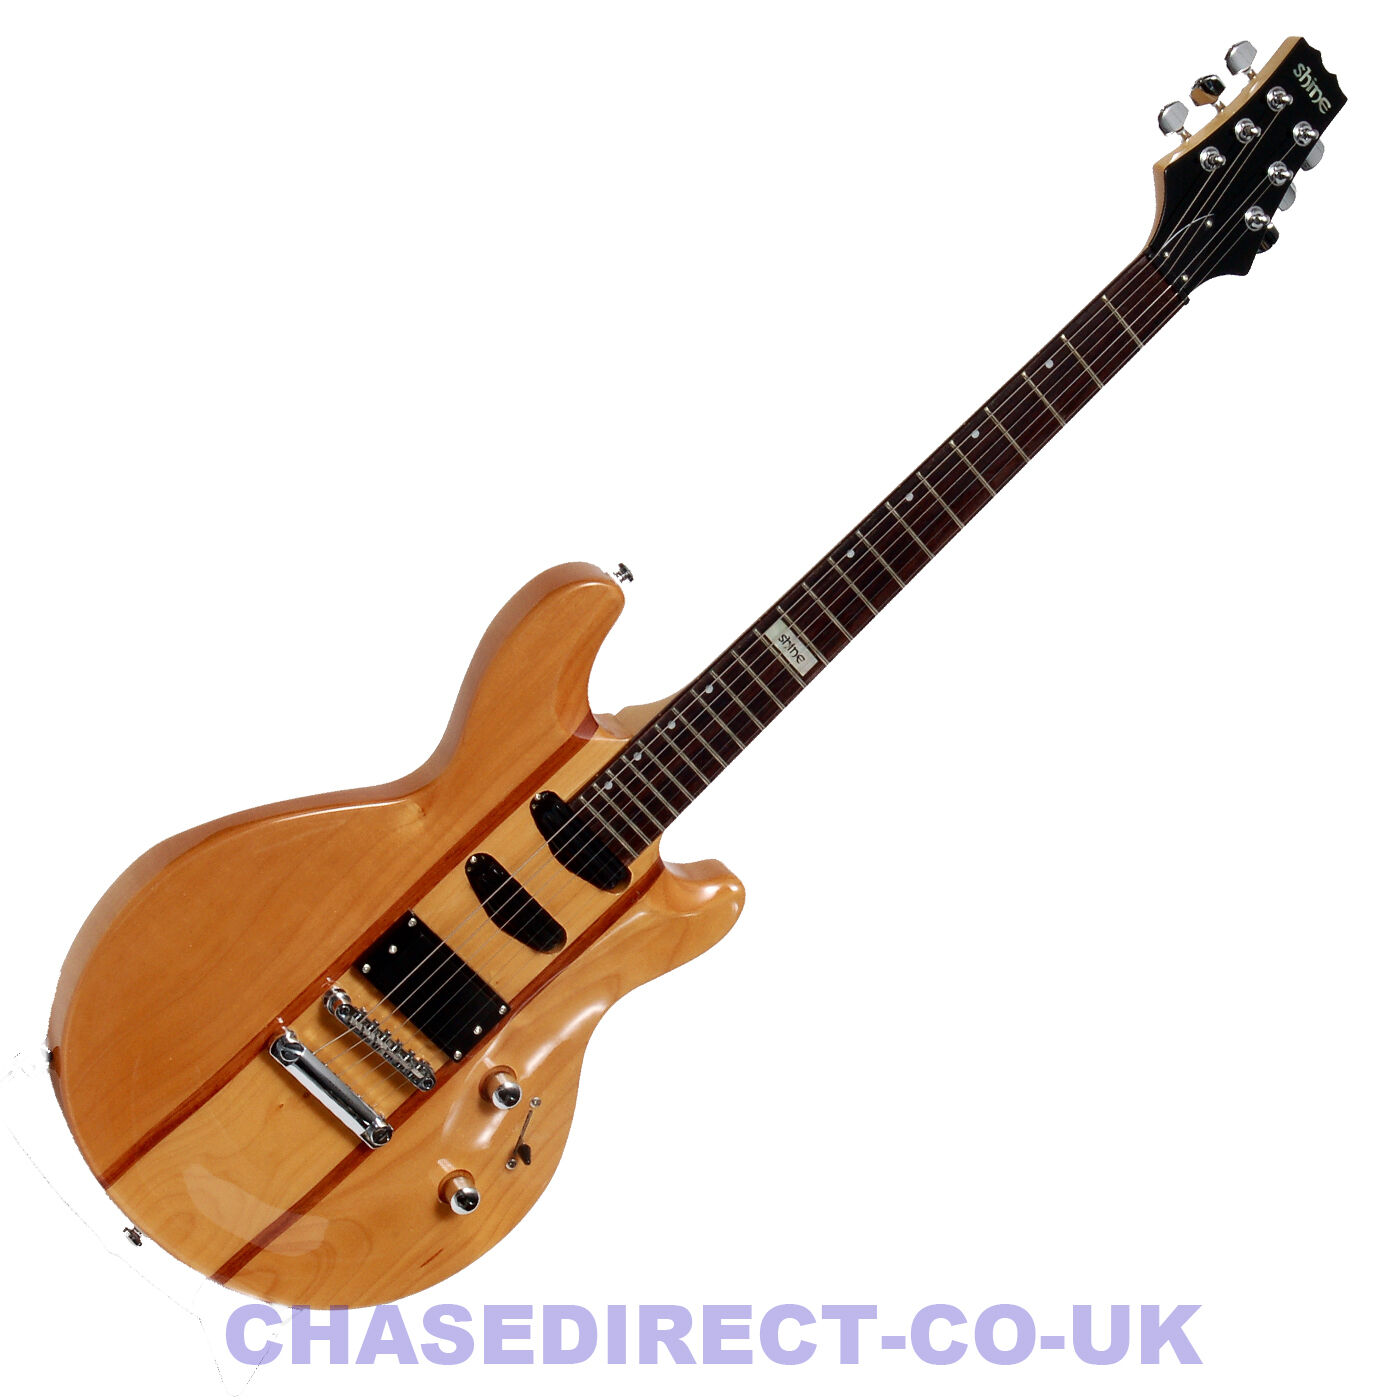 SHINE Electric Guitar SIL-601 NA Mahogany Les Paul Type Hot Rail Tune O Matic s